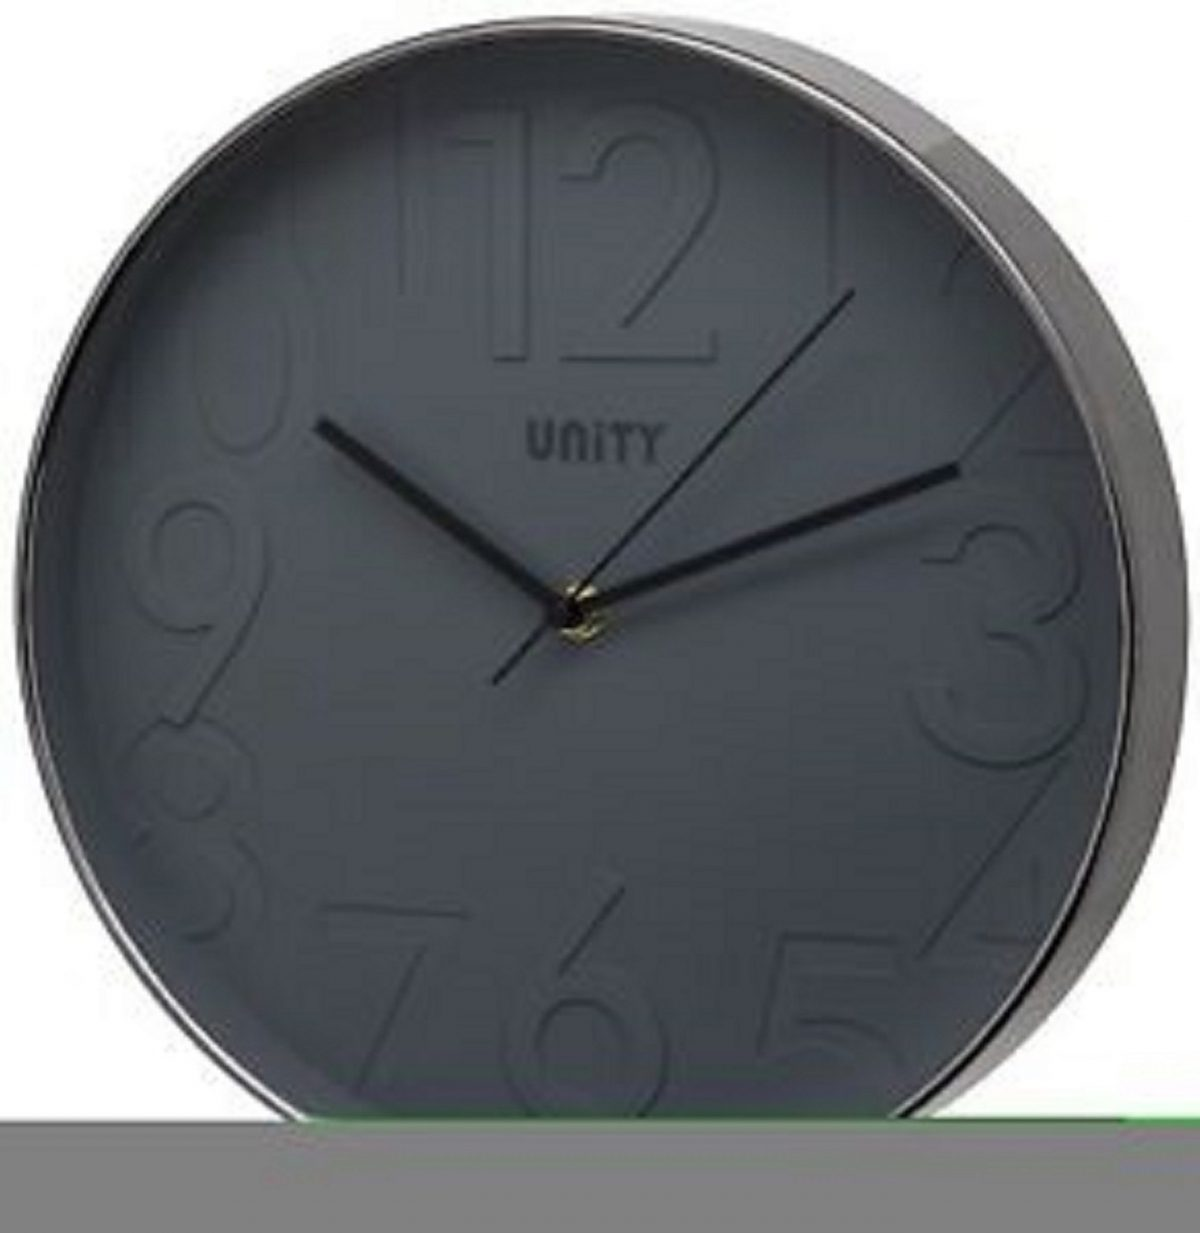 Unity Clifton Contemporary Silent Wall Clock - Black